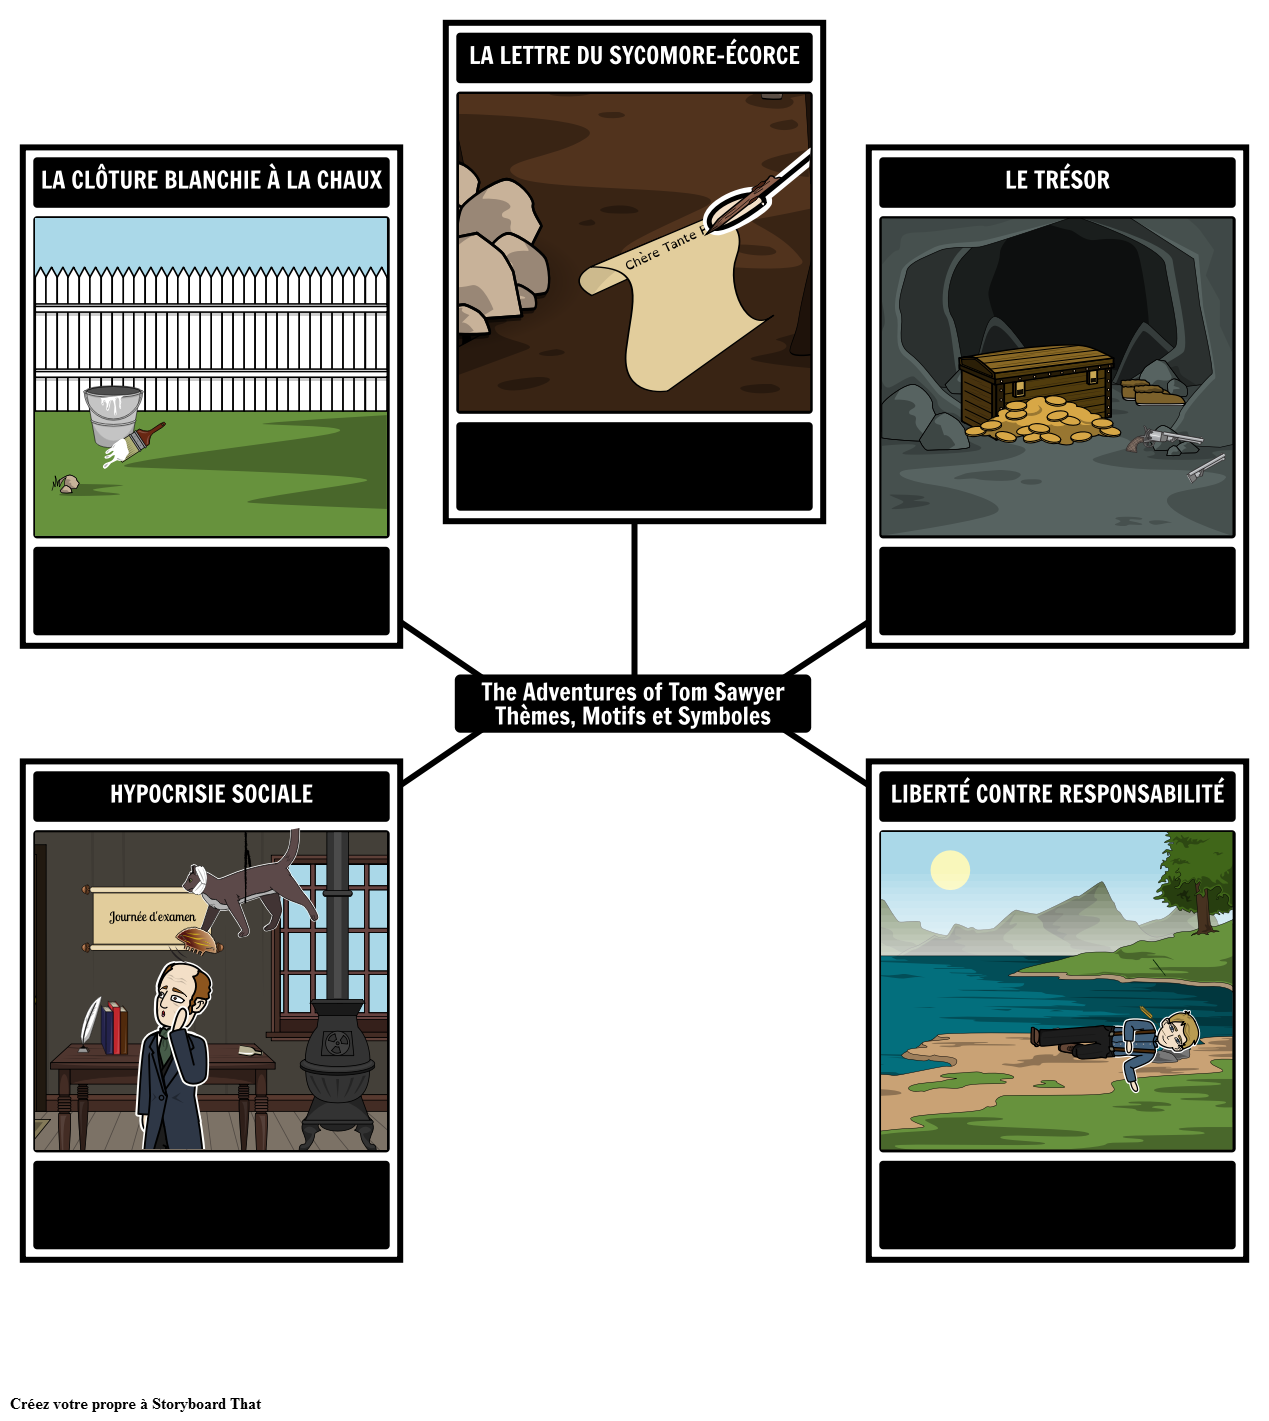 The Adventures of Tom Sawyer Thèmes, Motifs et Symboles